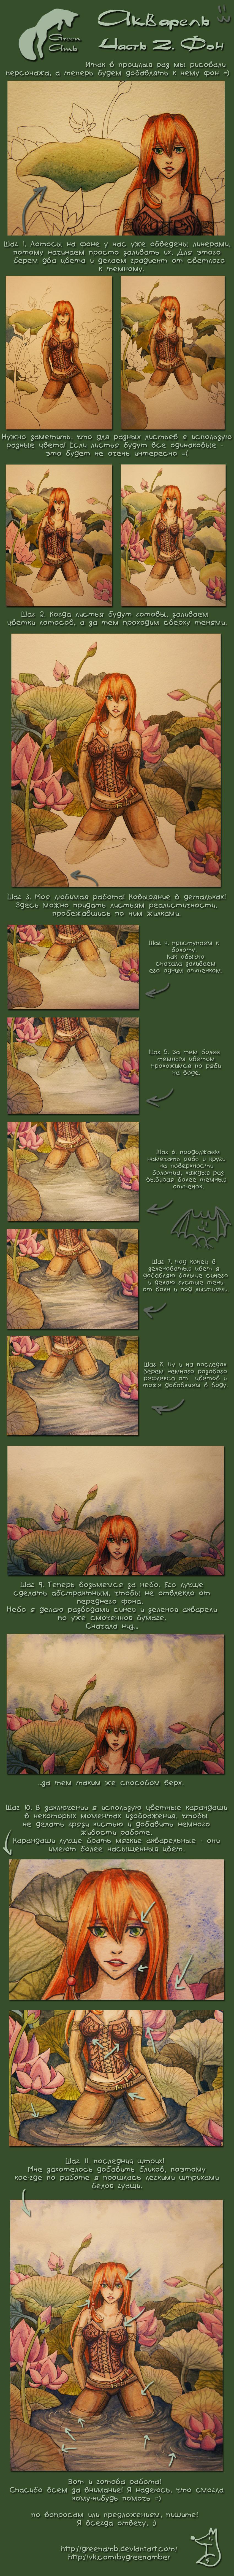 watercolor.tutorial. part 2 by GreenAmb